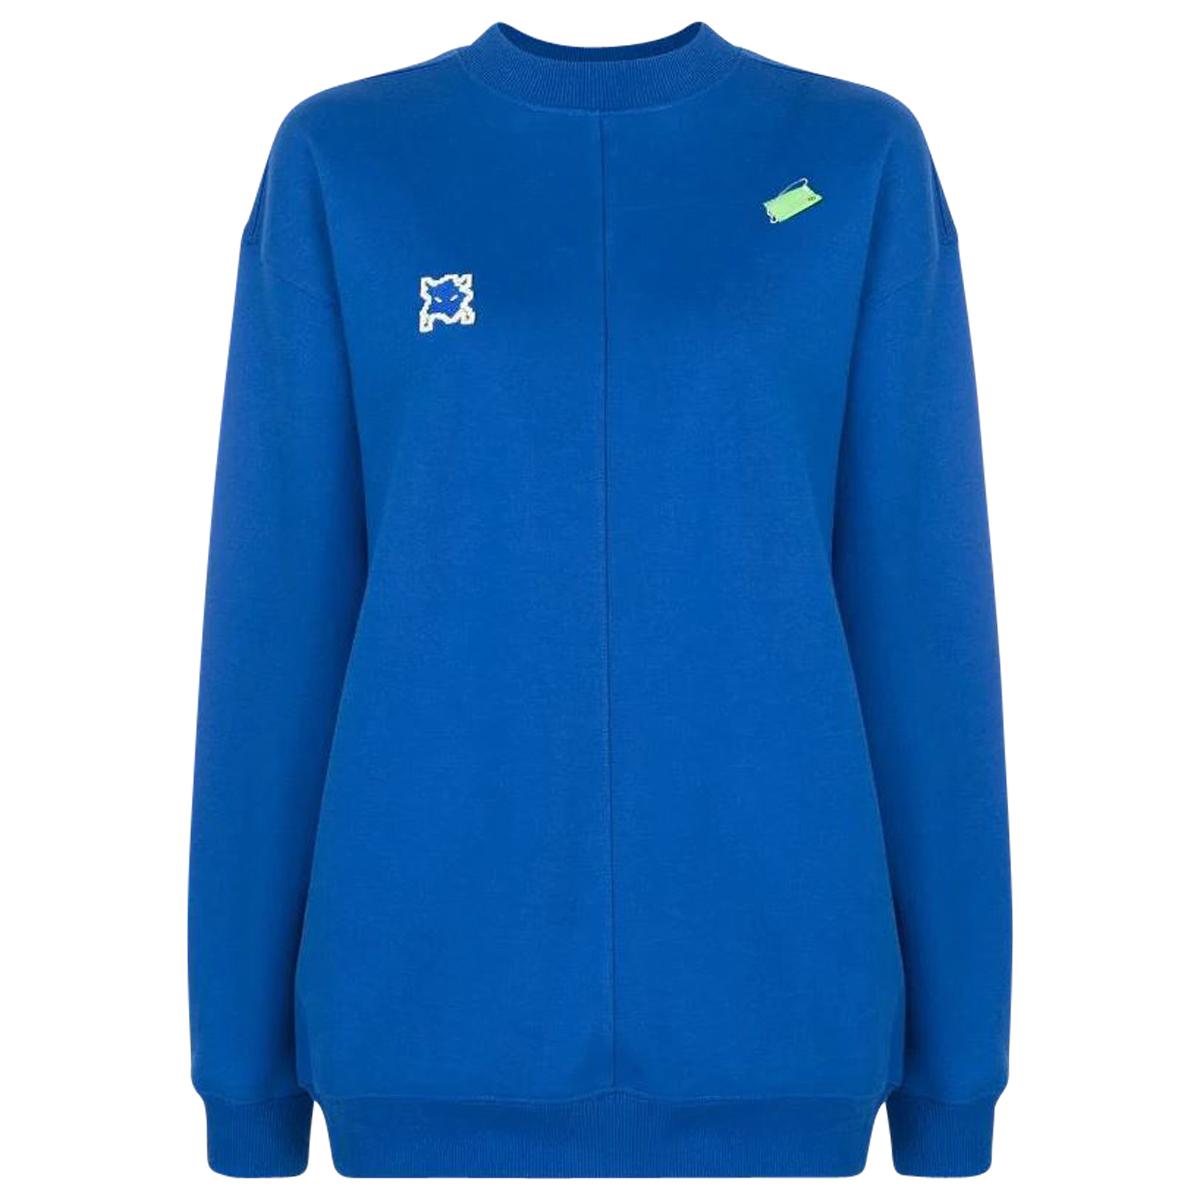 ADER Error Vastro Sweatshirt